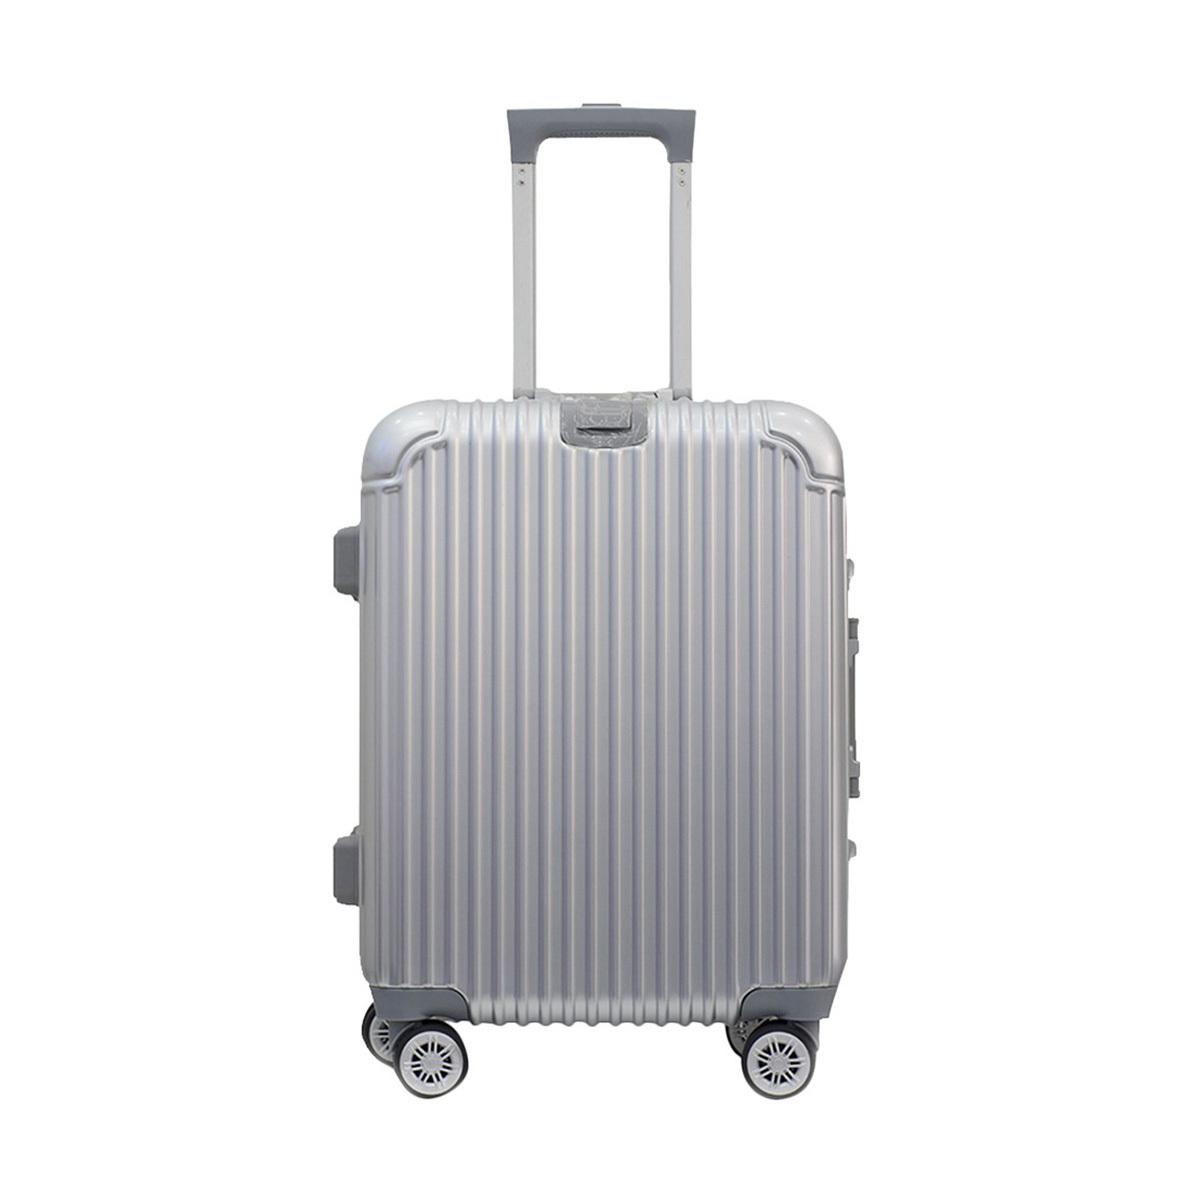 Vali Nắp Bật Trip PC023 Size 50